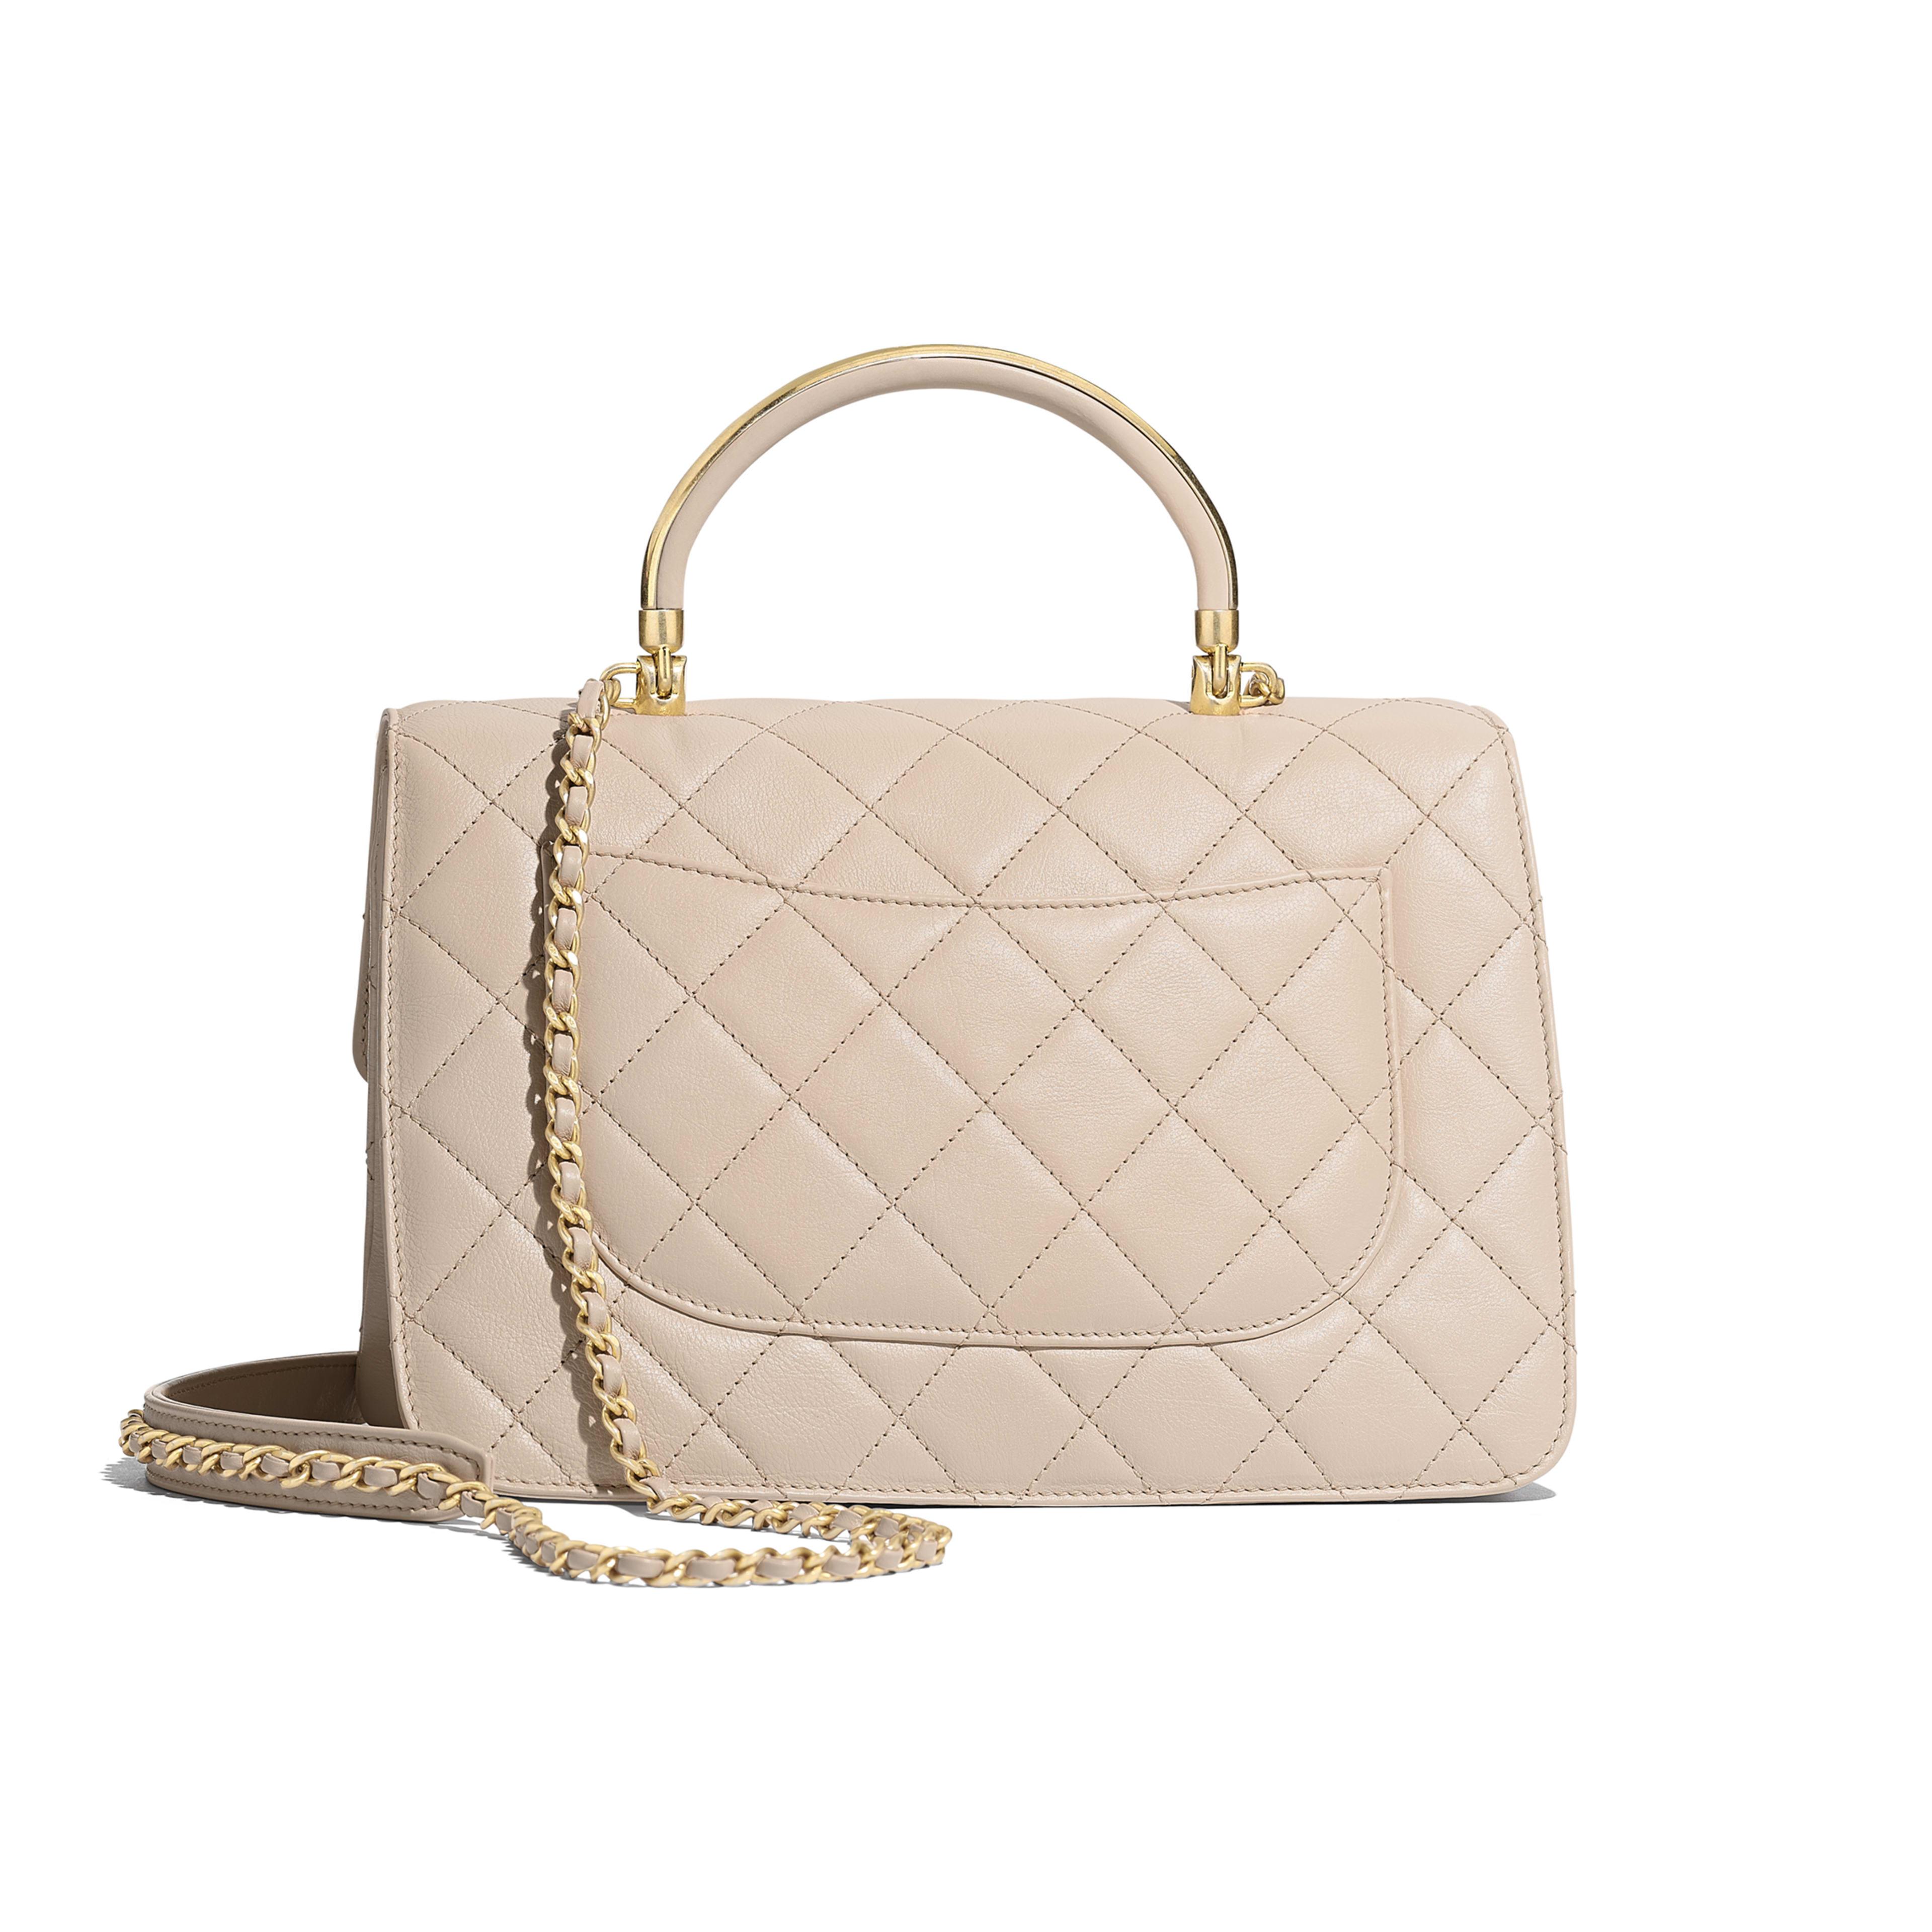 68952d44da13 Flap Bag with Top Handle - Beige - Calfskin   Gold-Tone Metal - Alternative  ...